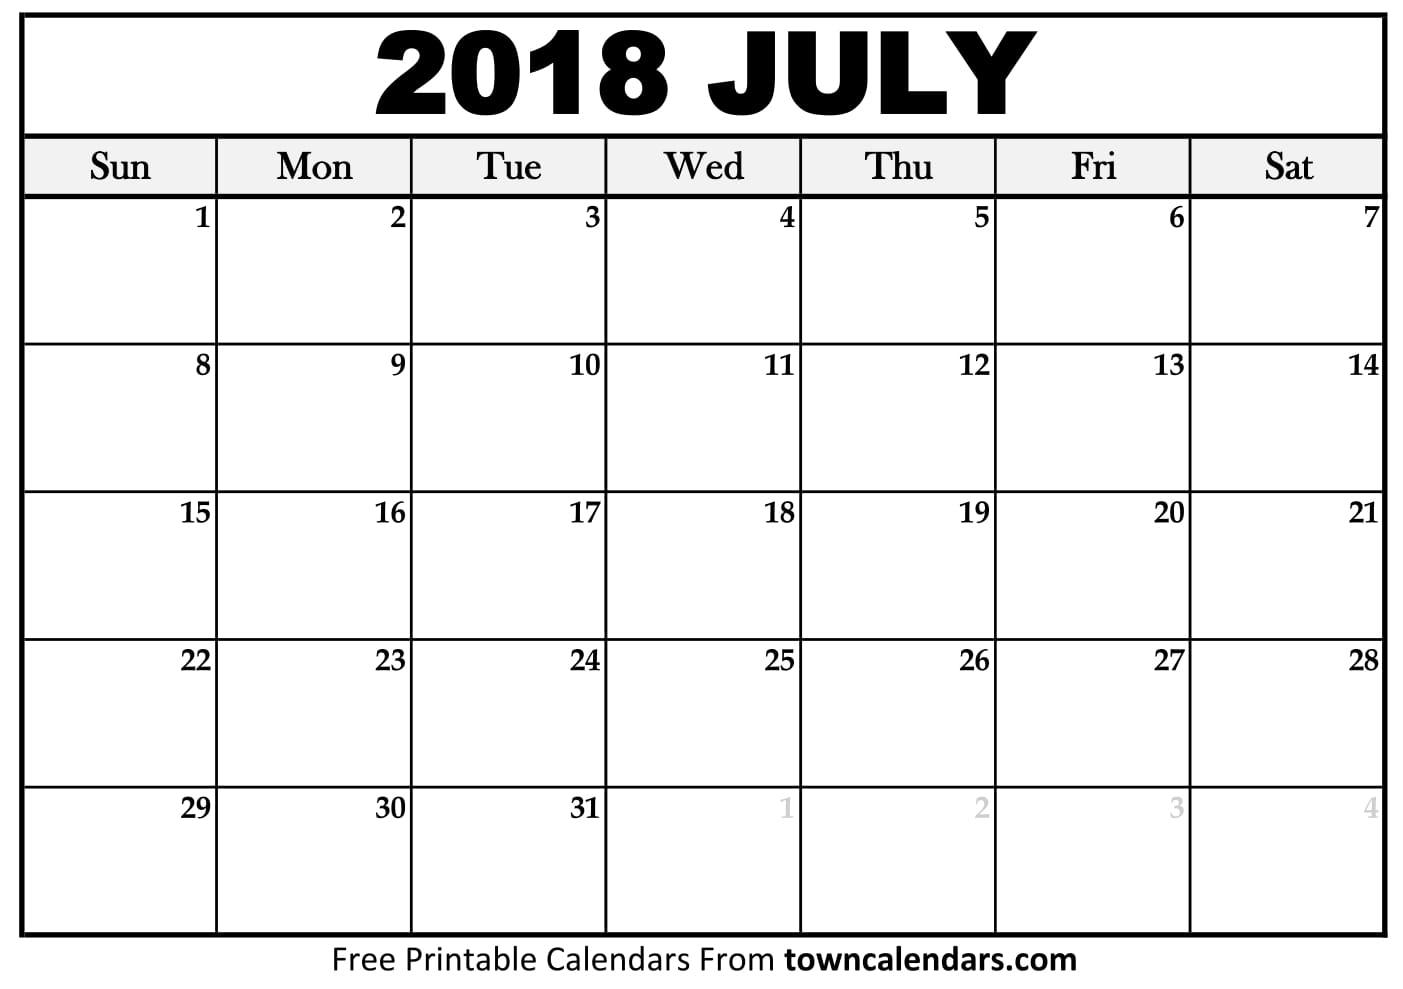 2018 July Calendar Singapore